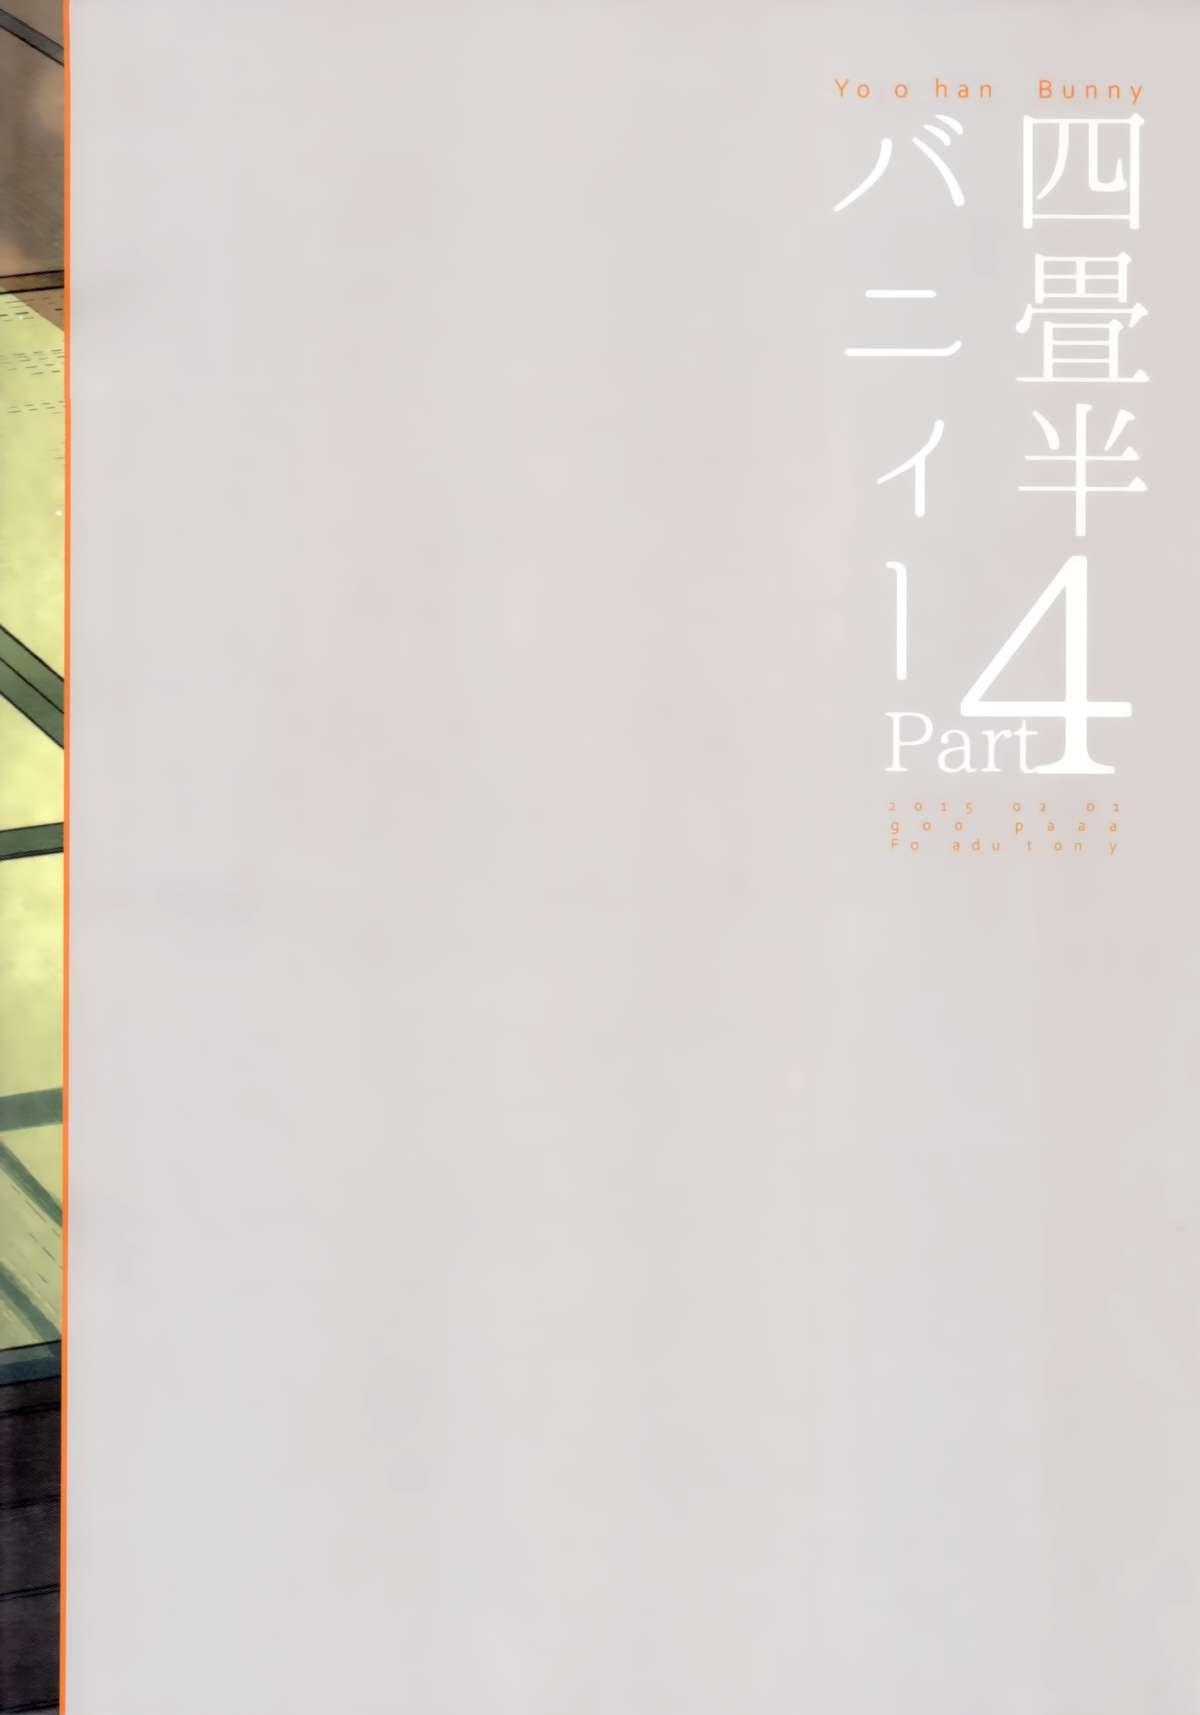 Yojo-han Bunny Part 4 1